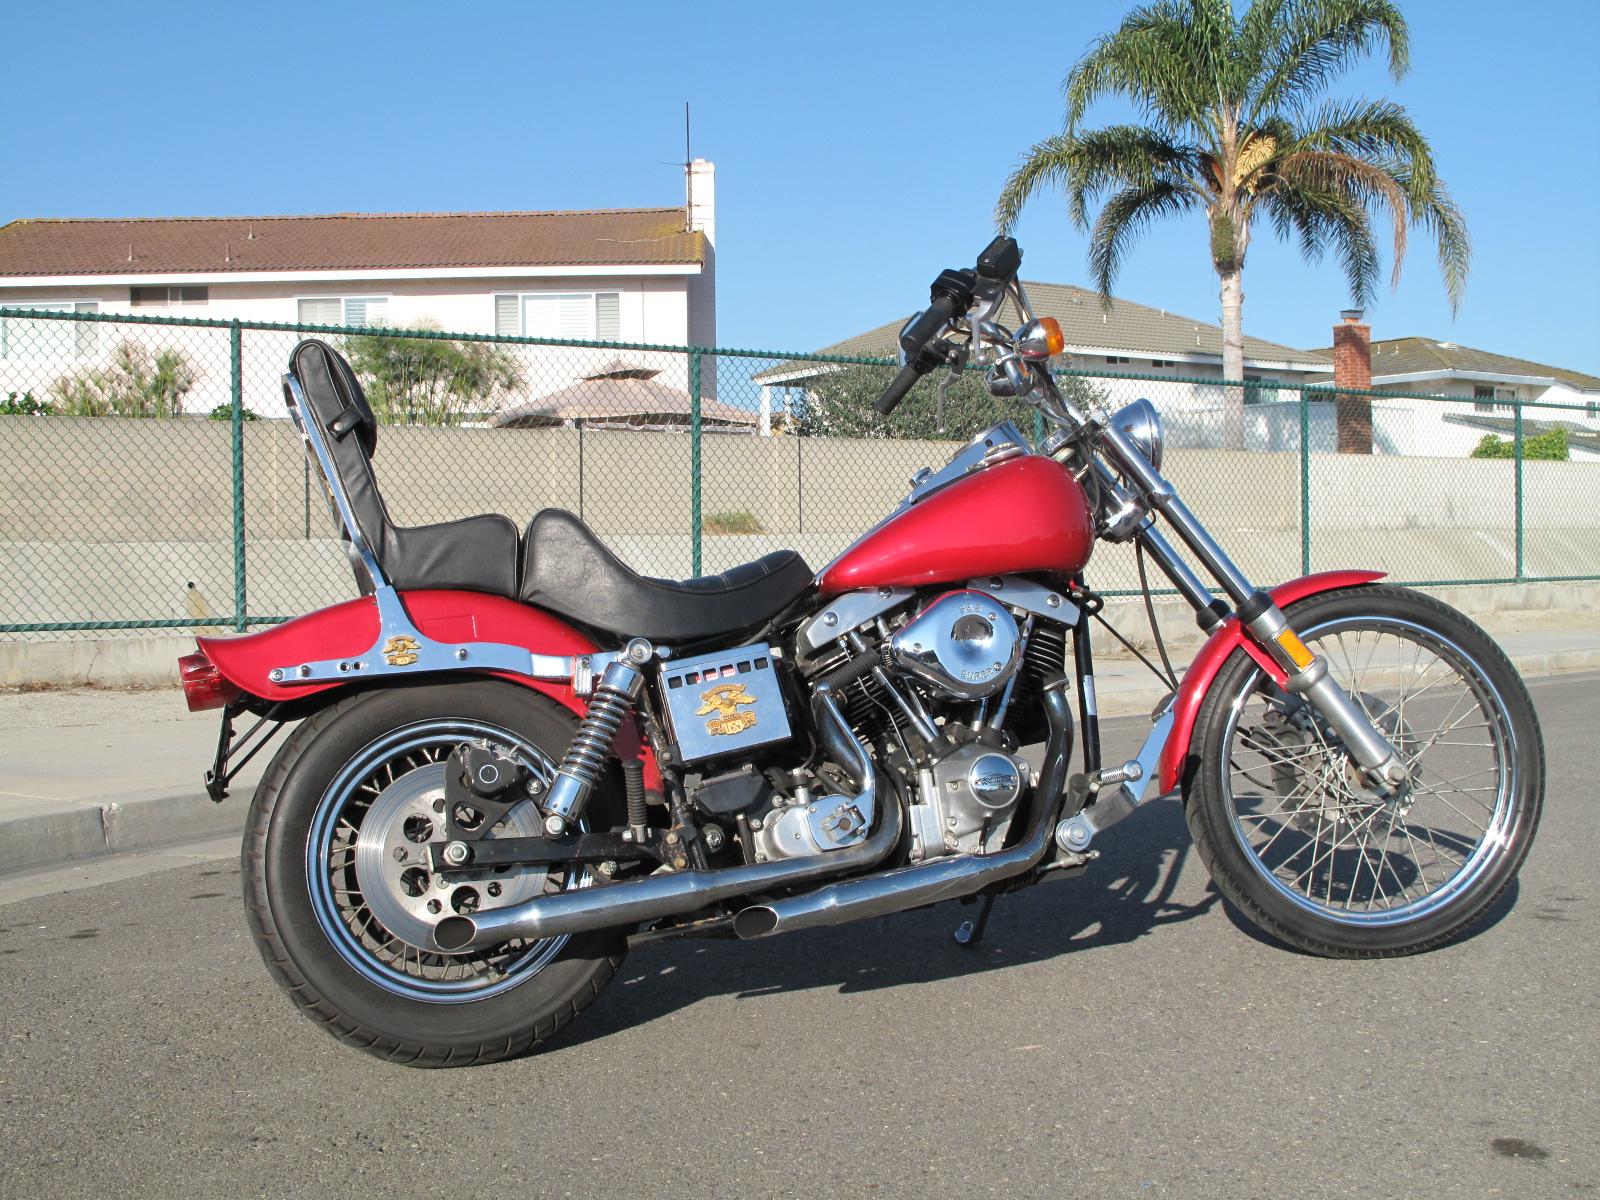 cycle zombies blog: 83 FX Shovelhead For sale